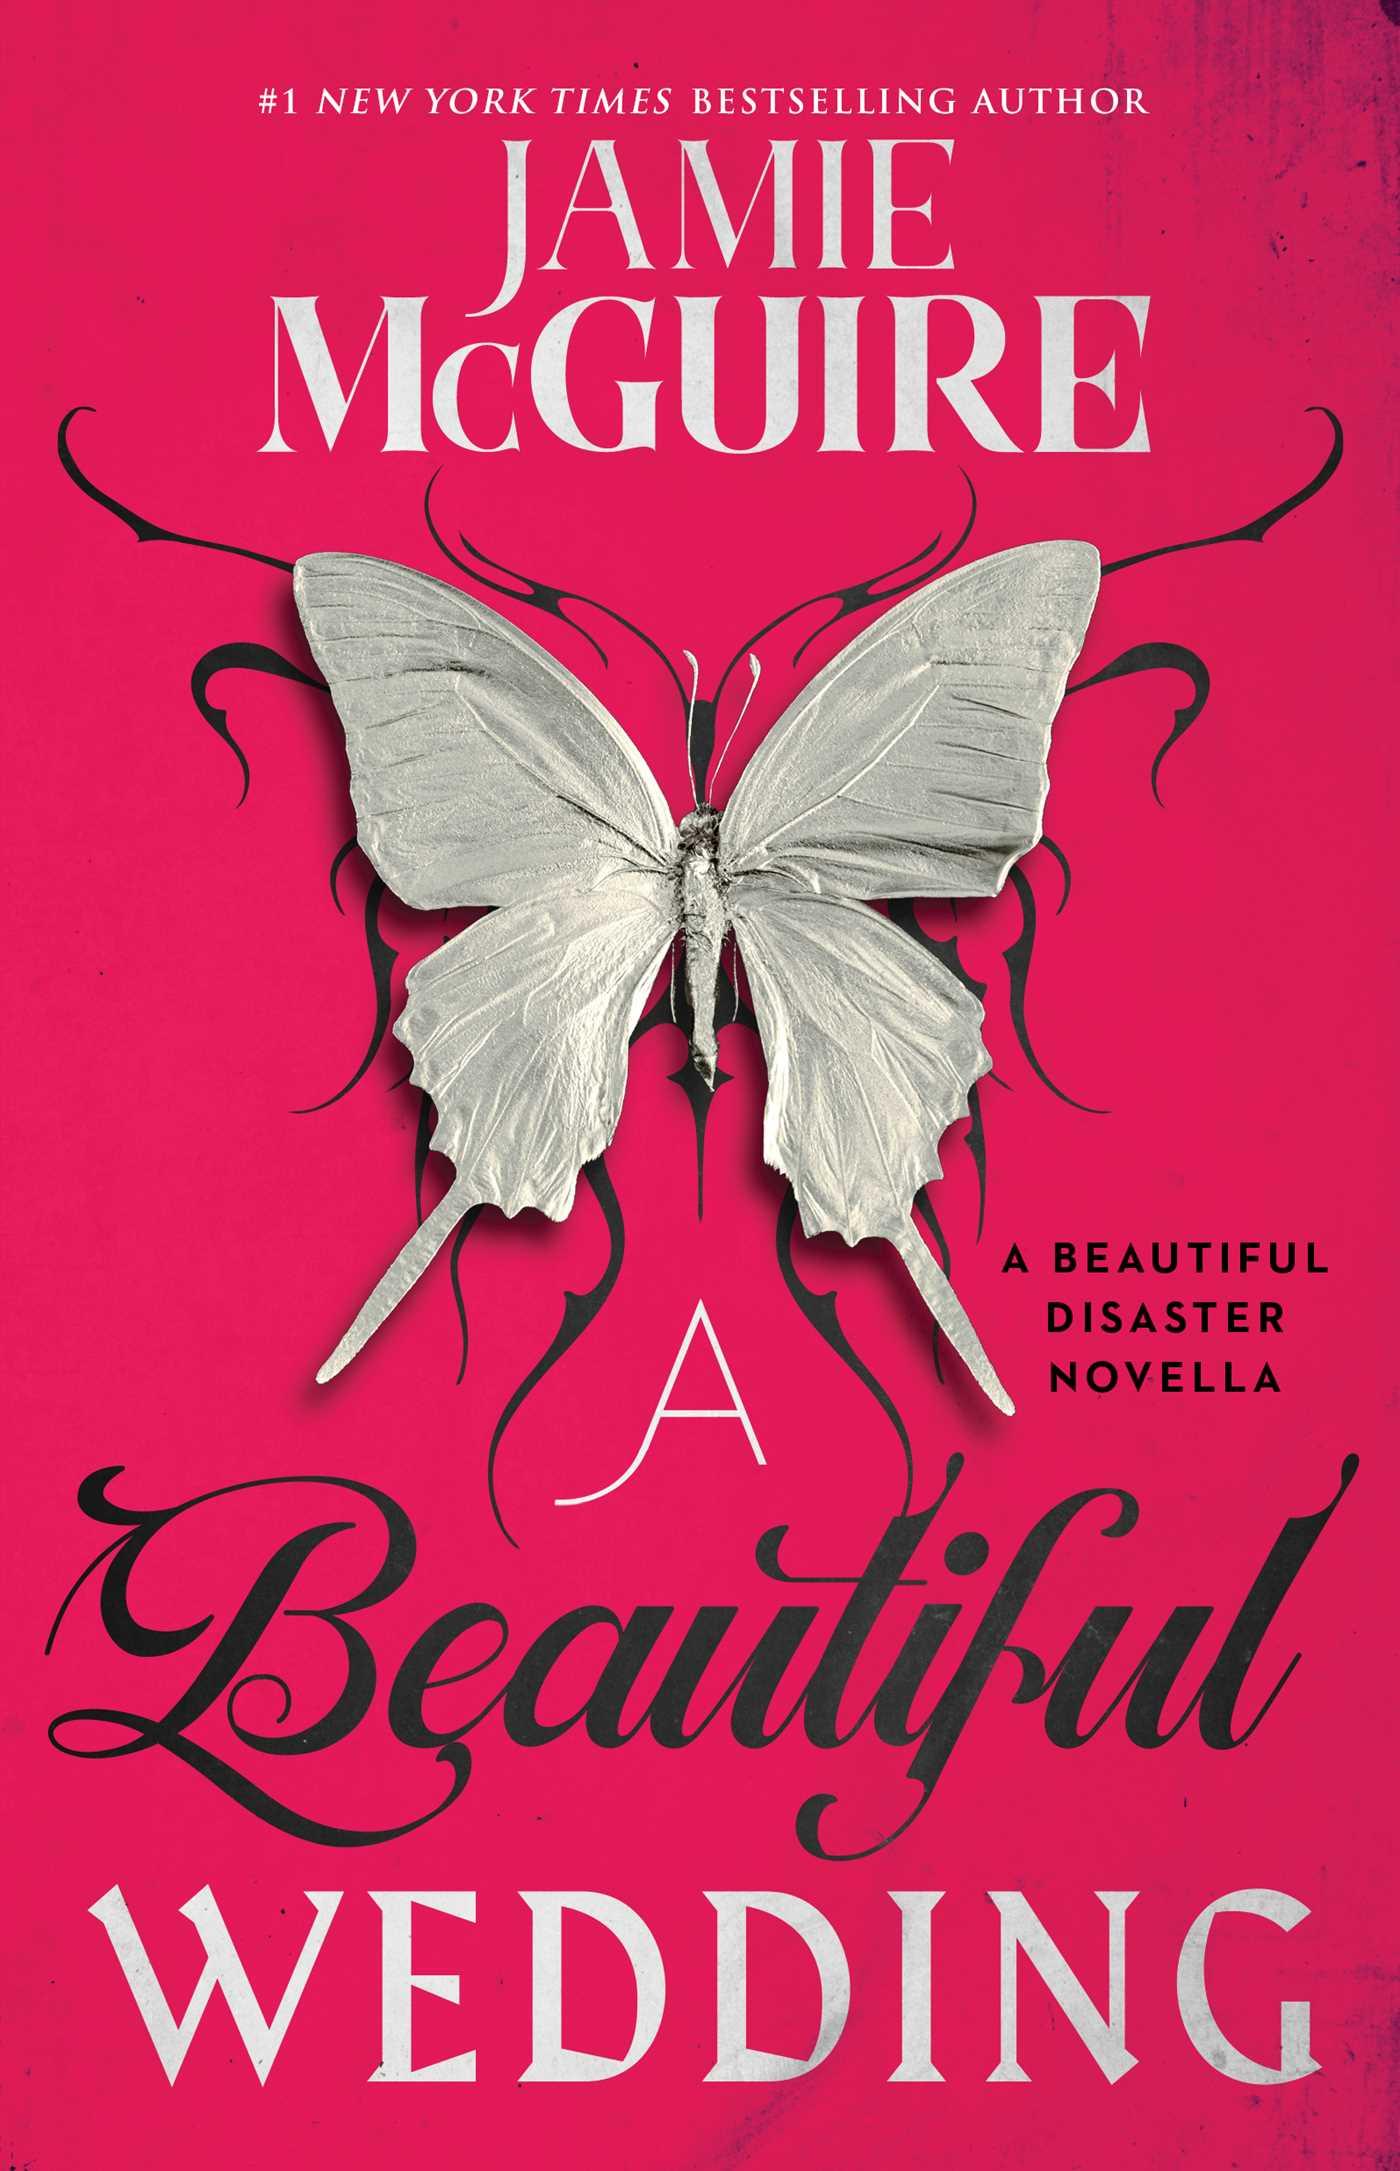 a beautiful wedding jamie mcguire pdf download free